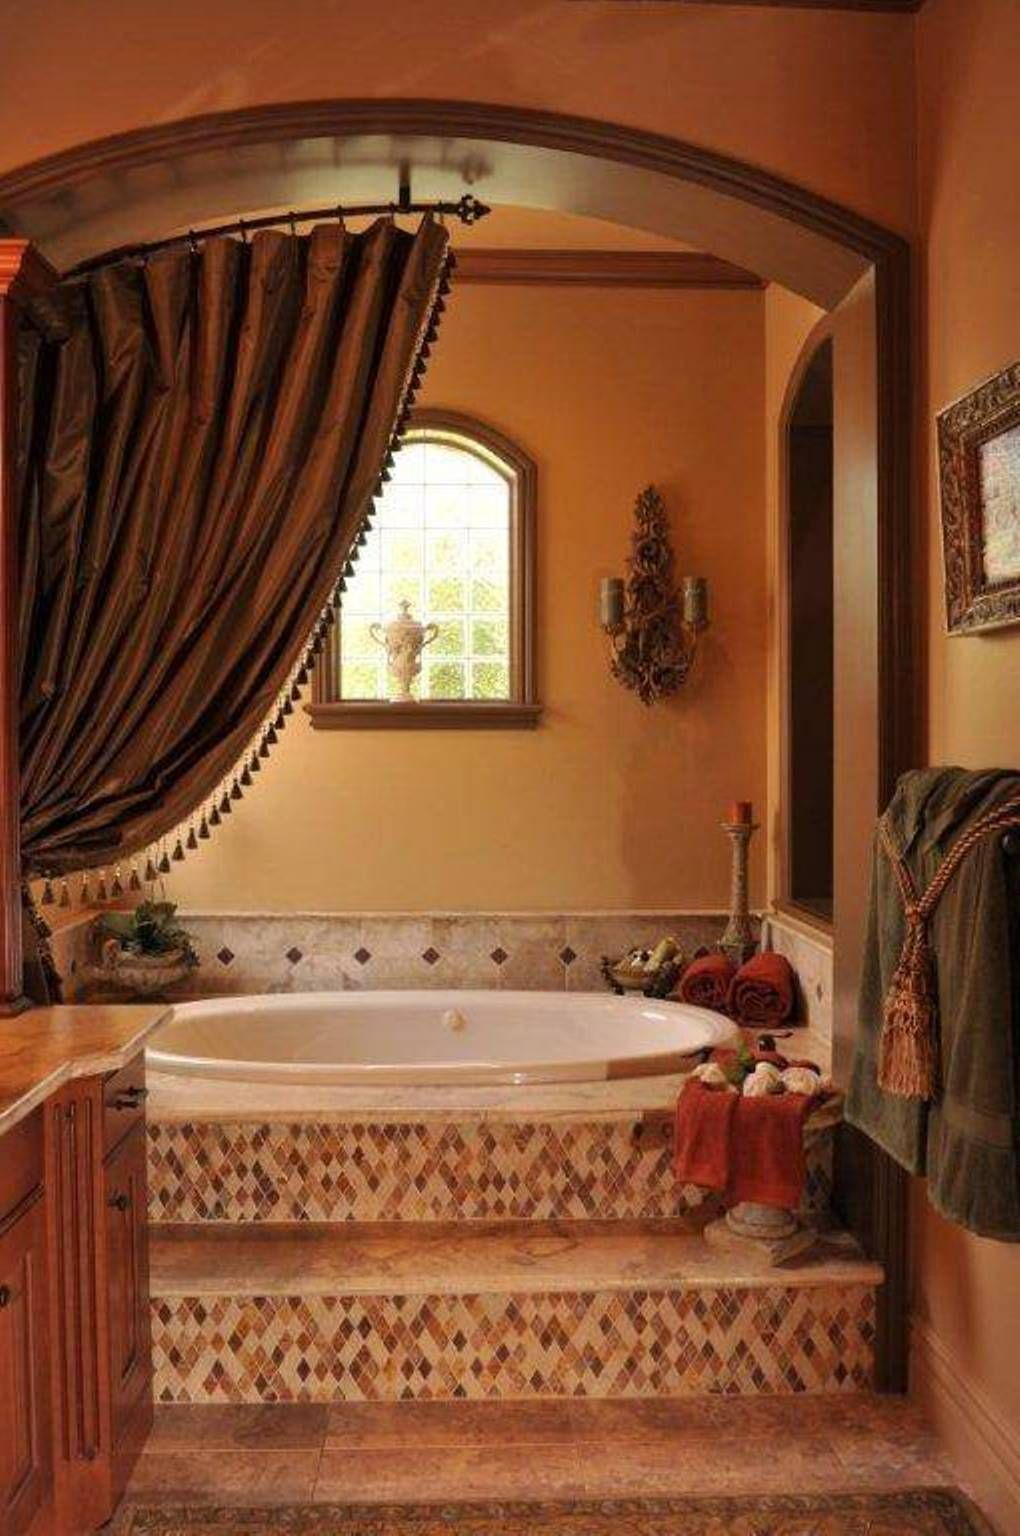 Warm Tuscany Bathrooms Designs  Tuscan Bathroom Bathroom Designs Extraordinary Tuscan Bathroom Design Inspiration Design